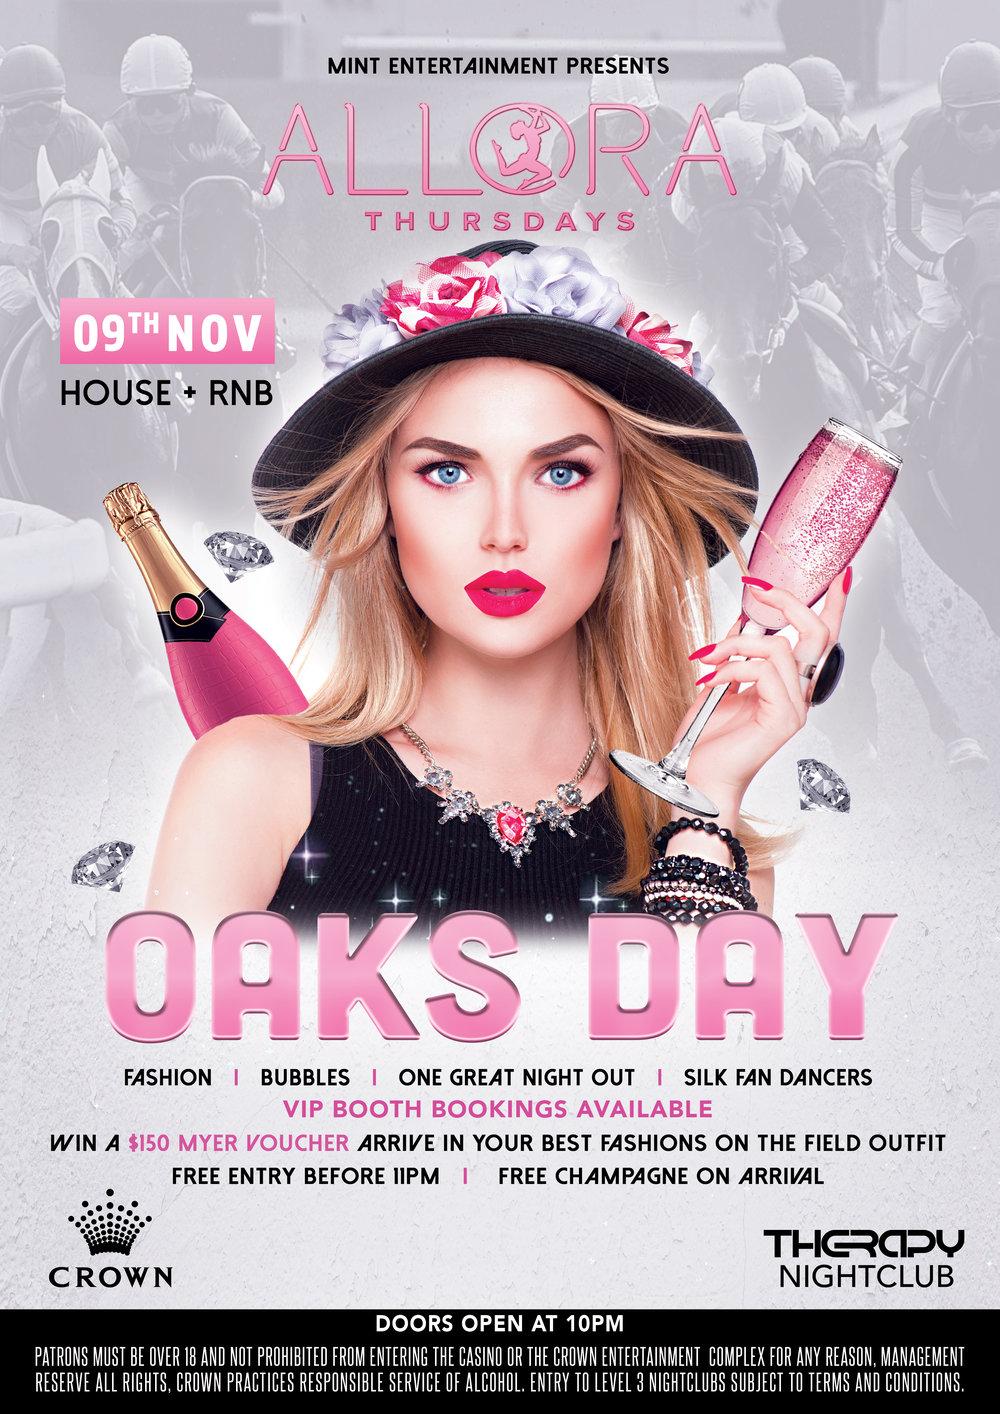 171109-Crown-Melbourne-Nightclubs-Therapy-Allora-OaksDay-FacebookFlyer.jpg